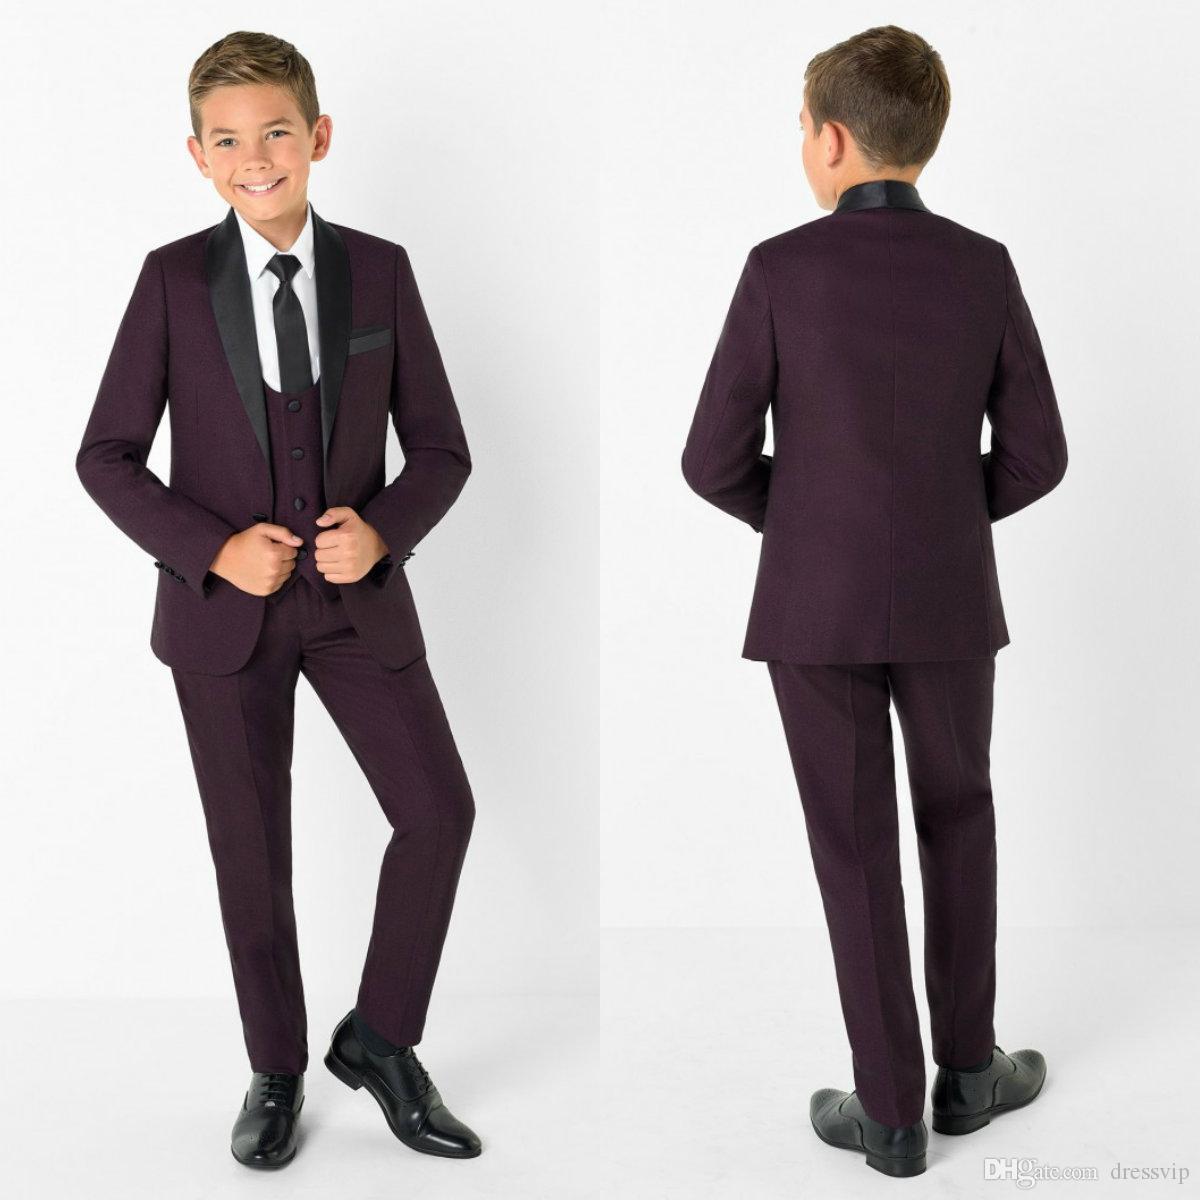 Little Boy Formal Suits Dinner Tuxedos for Wedding Party Little Boy Groomsmen Kids Children Prom Suit Formal Wear (Jacket+Pants+Vest)